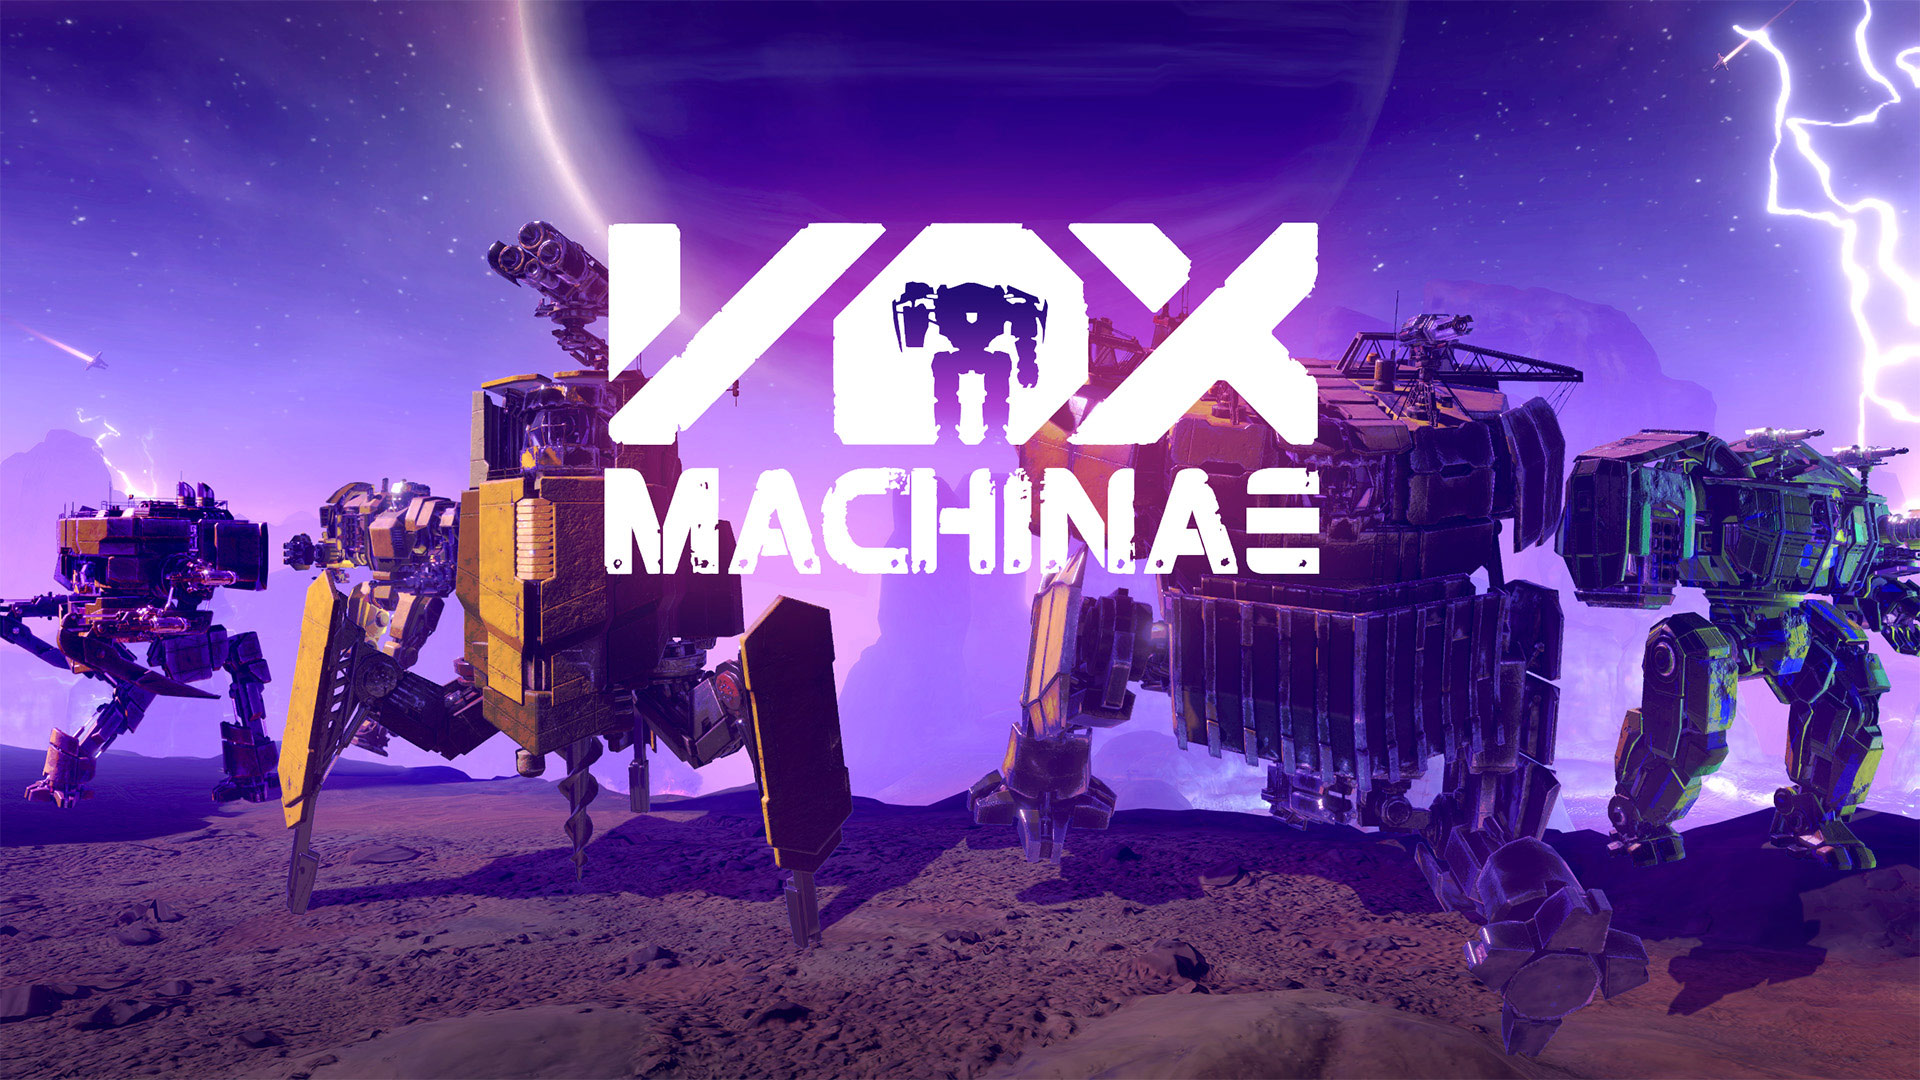 vox-machinae-vr